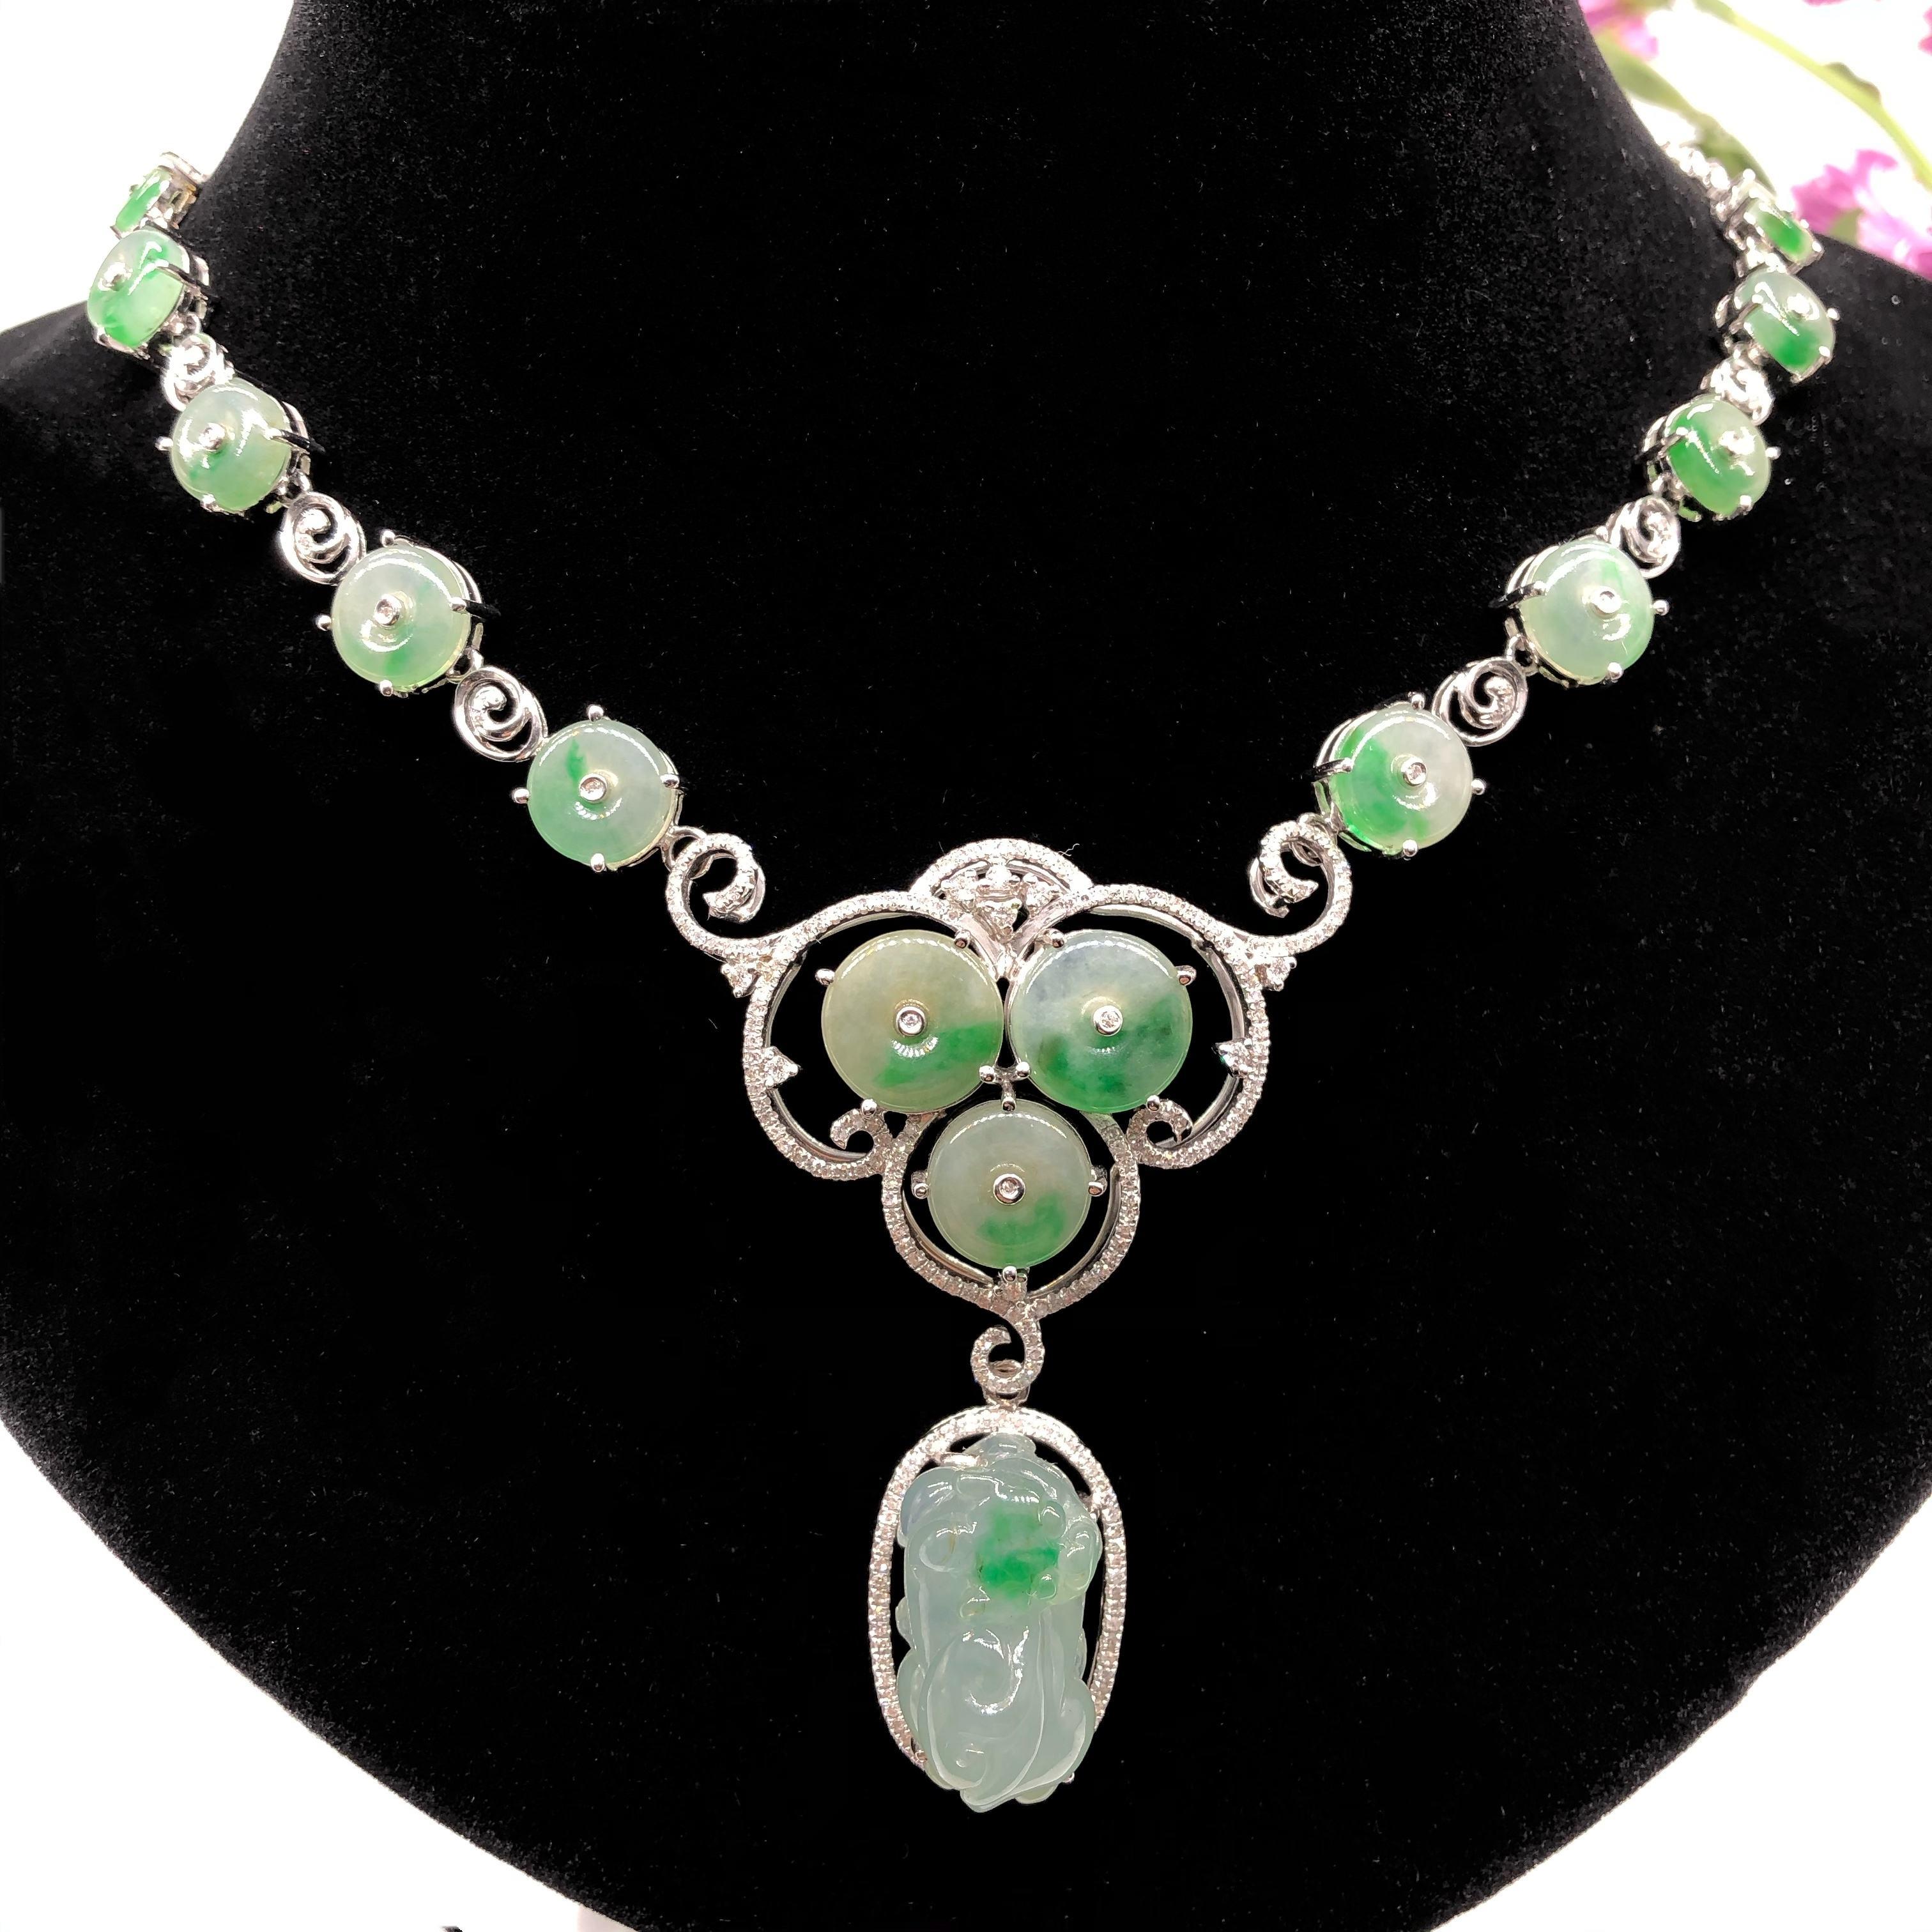 Yellow Jade Magatama Necklace Pendant Natural Gemstone Crystal Healing FORTUNE